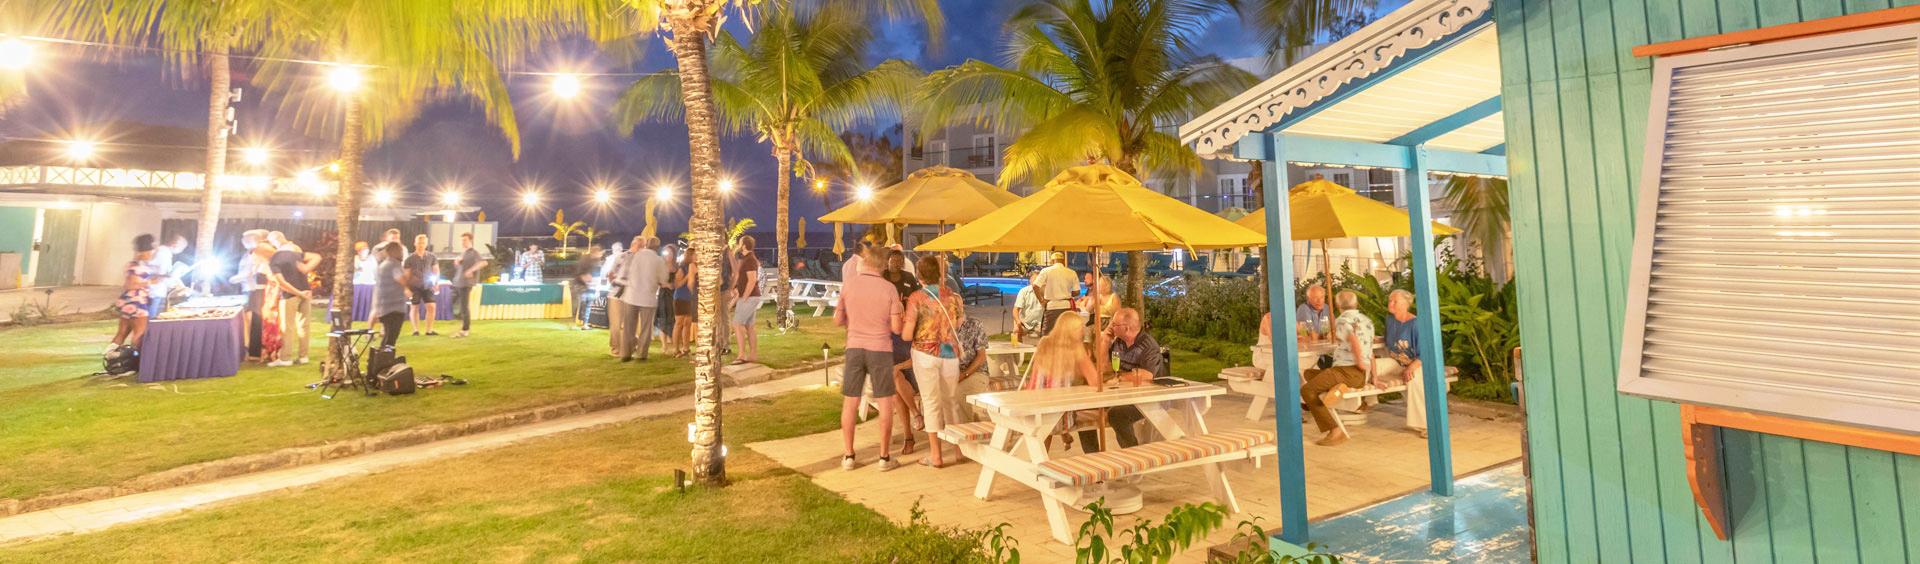 Cultural Activities at Christ Church, Barbados